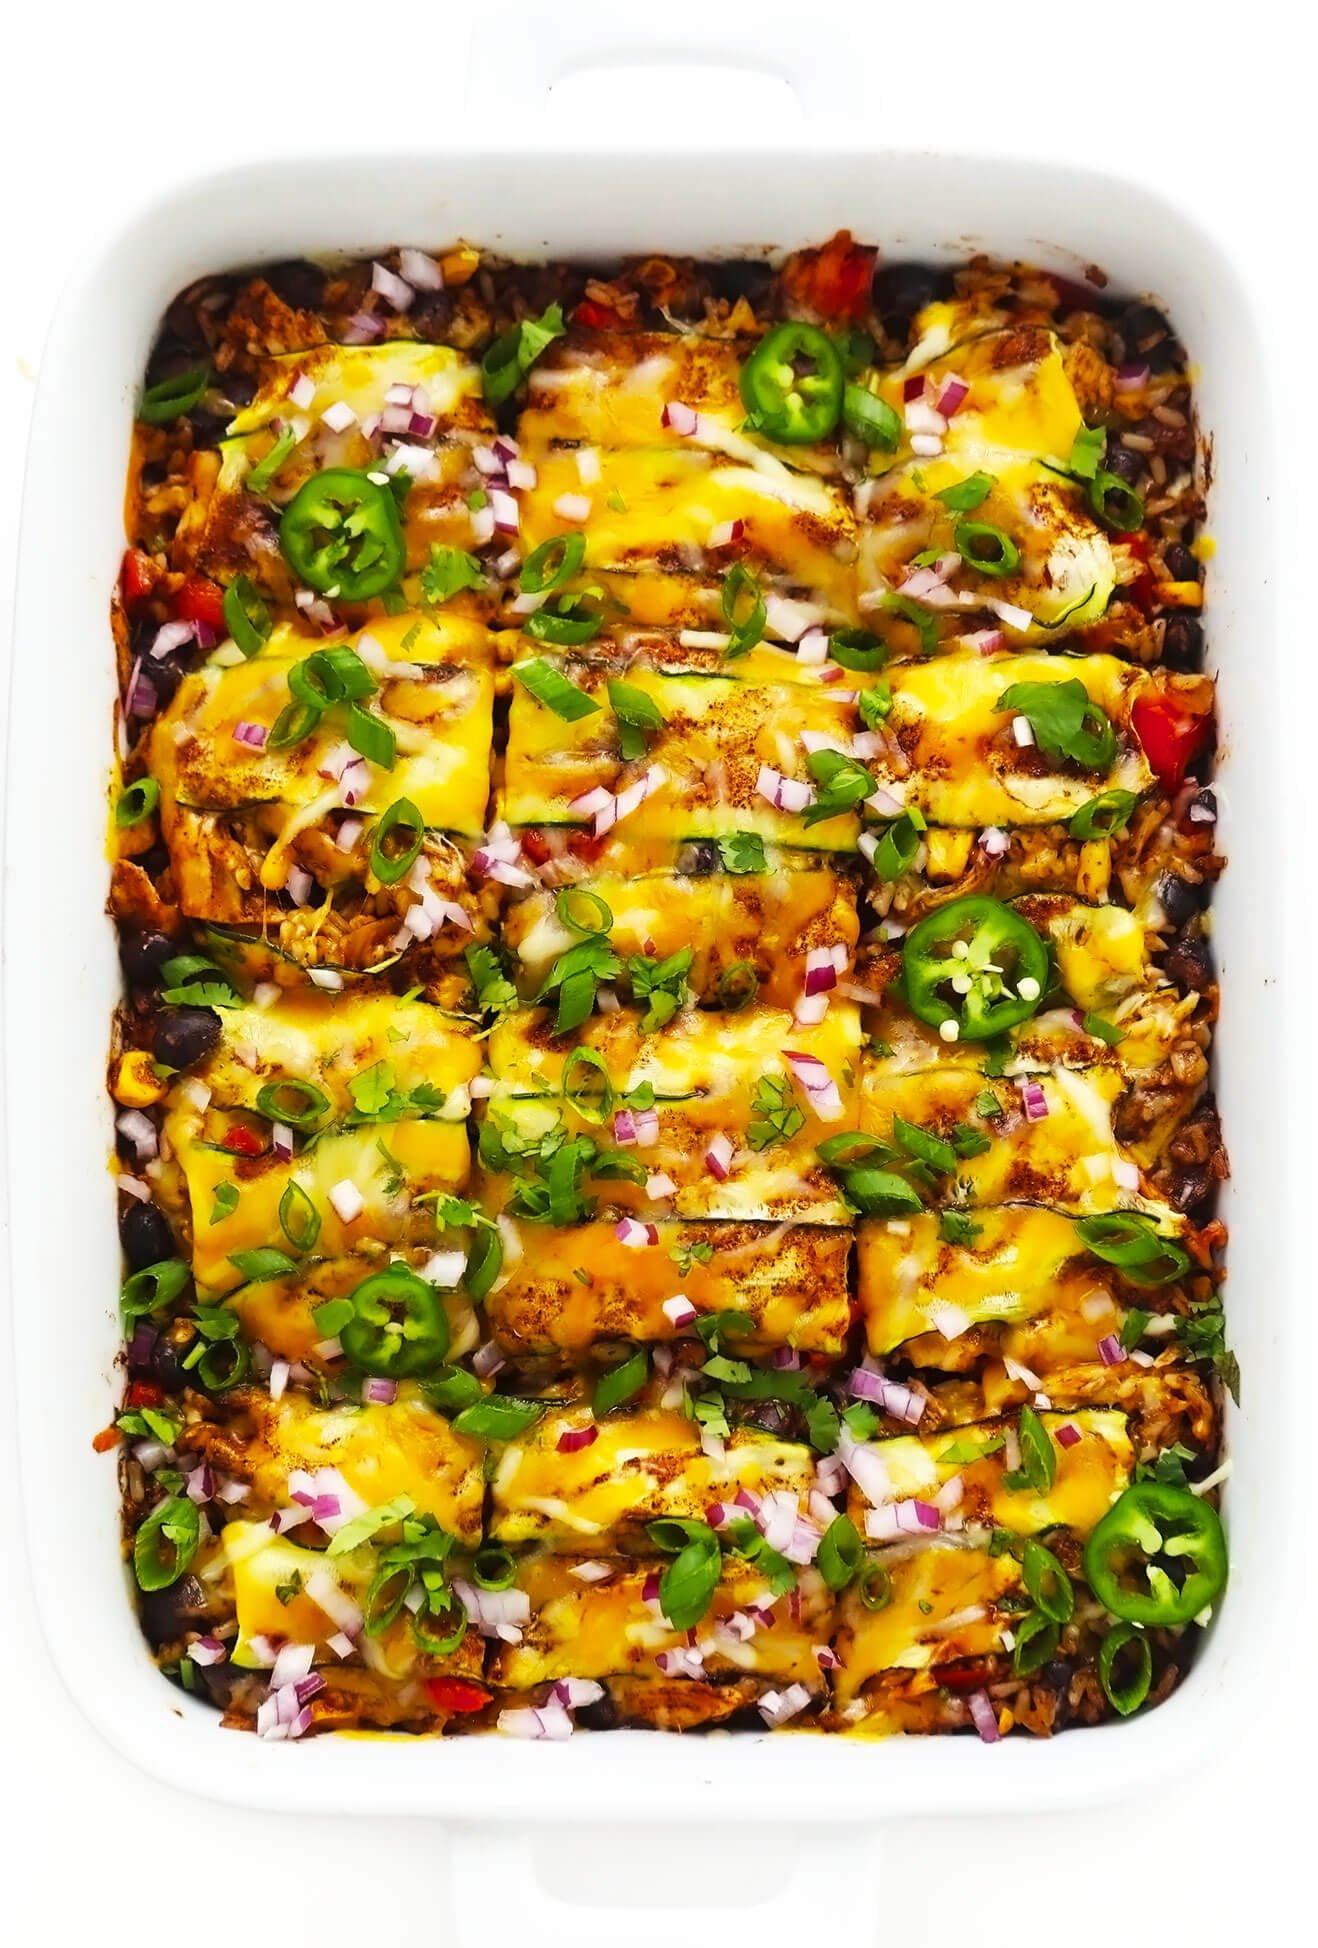 Zucchini Chicken Enchilada Casserole in Baking Dish